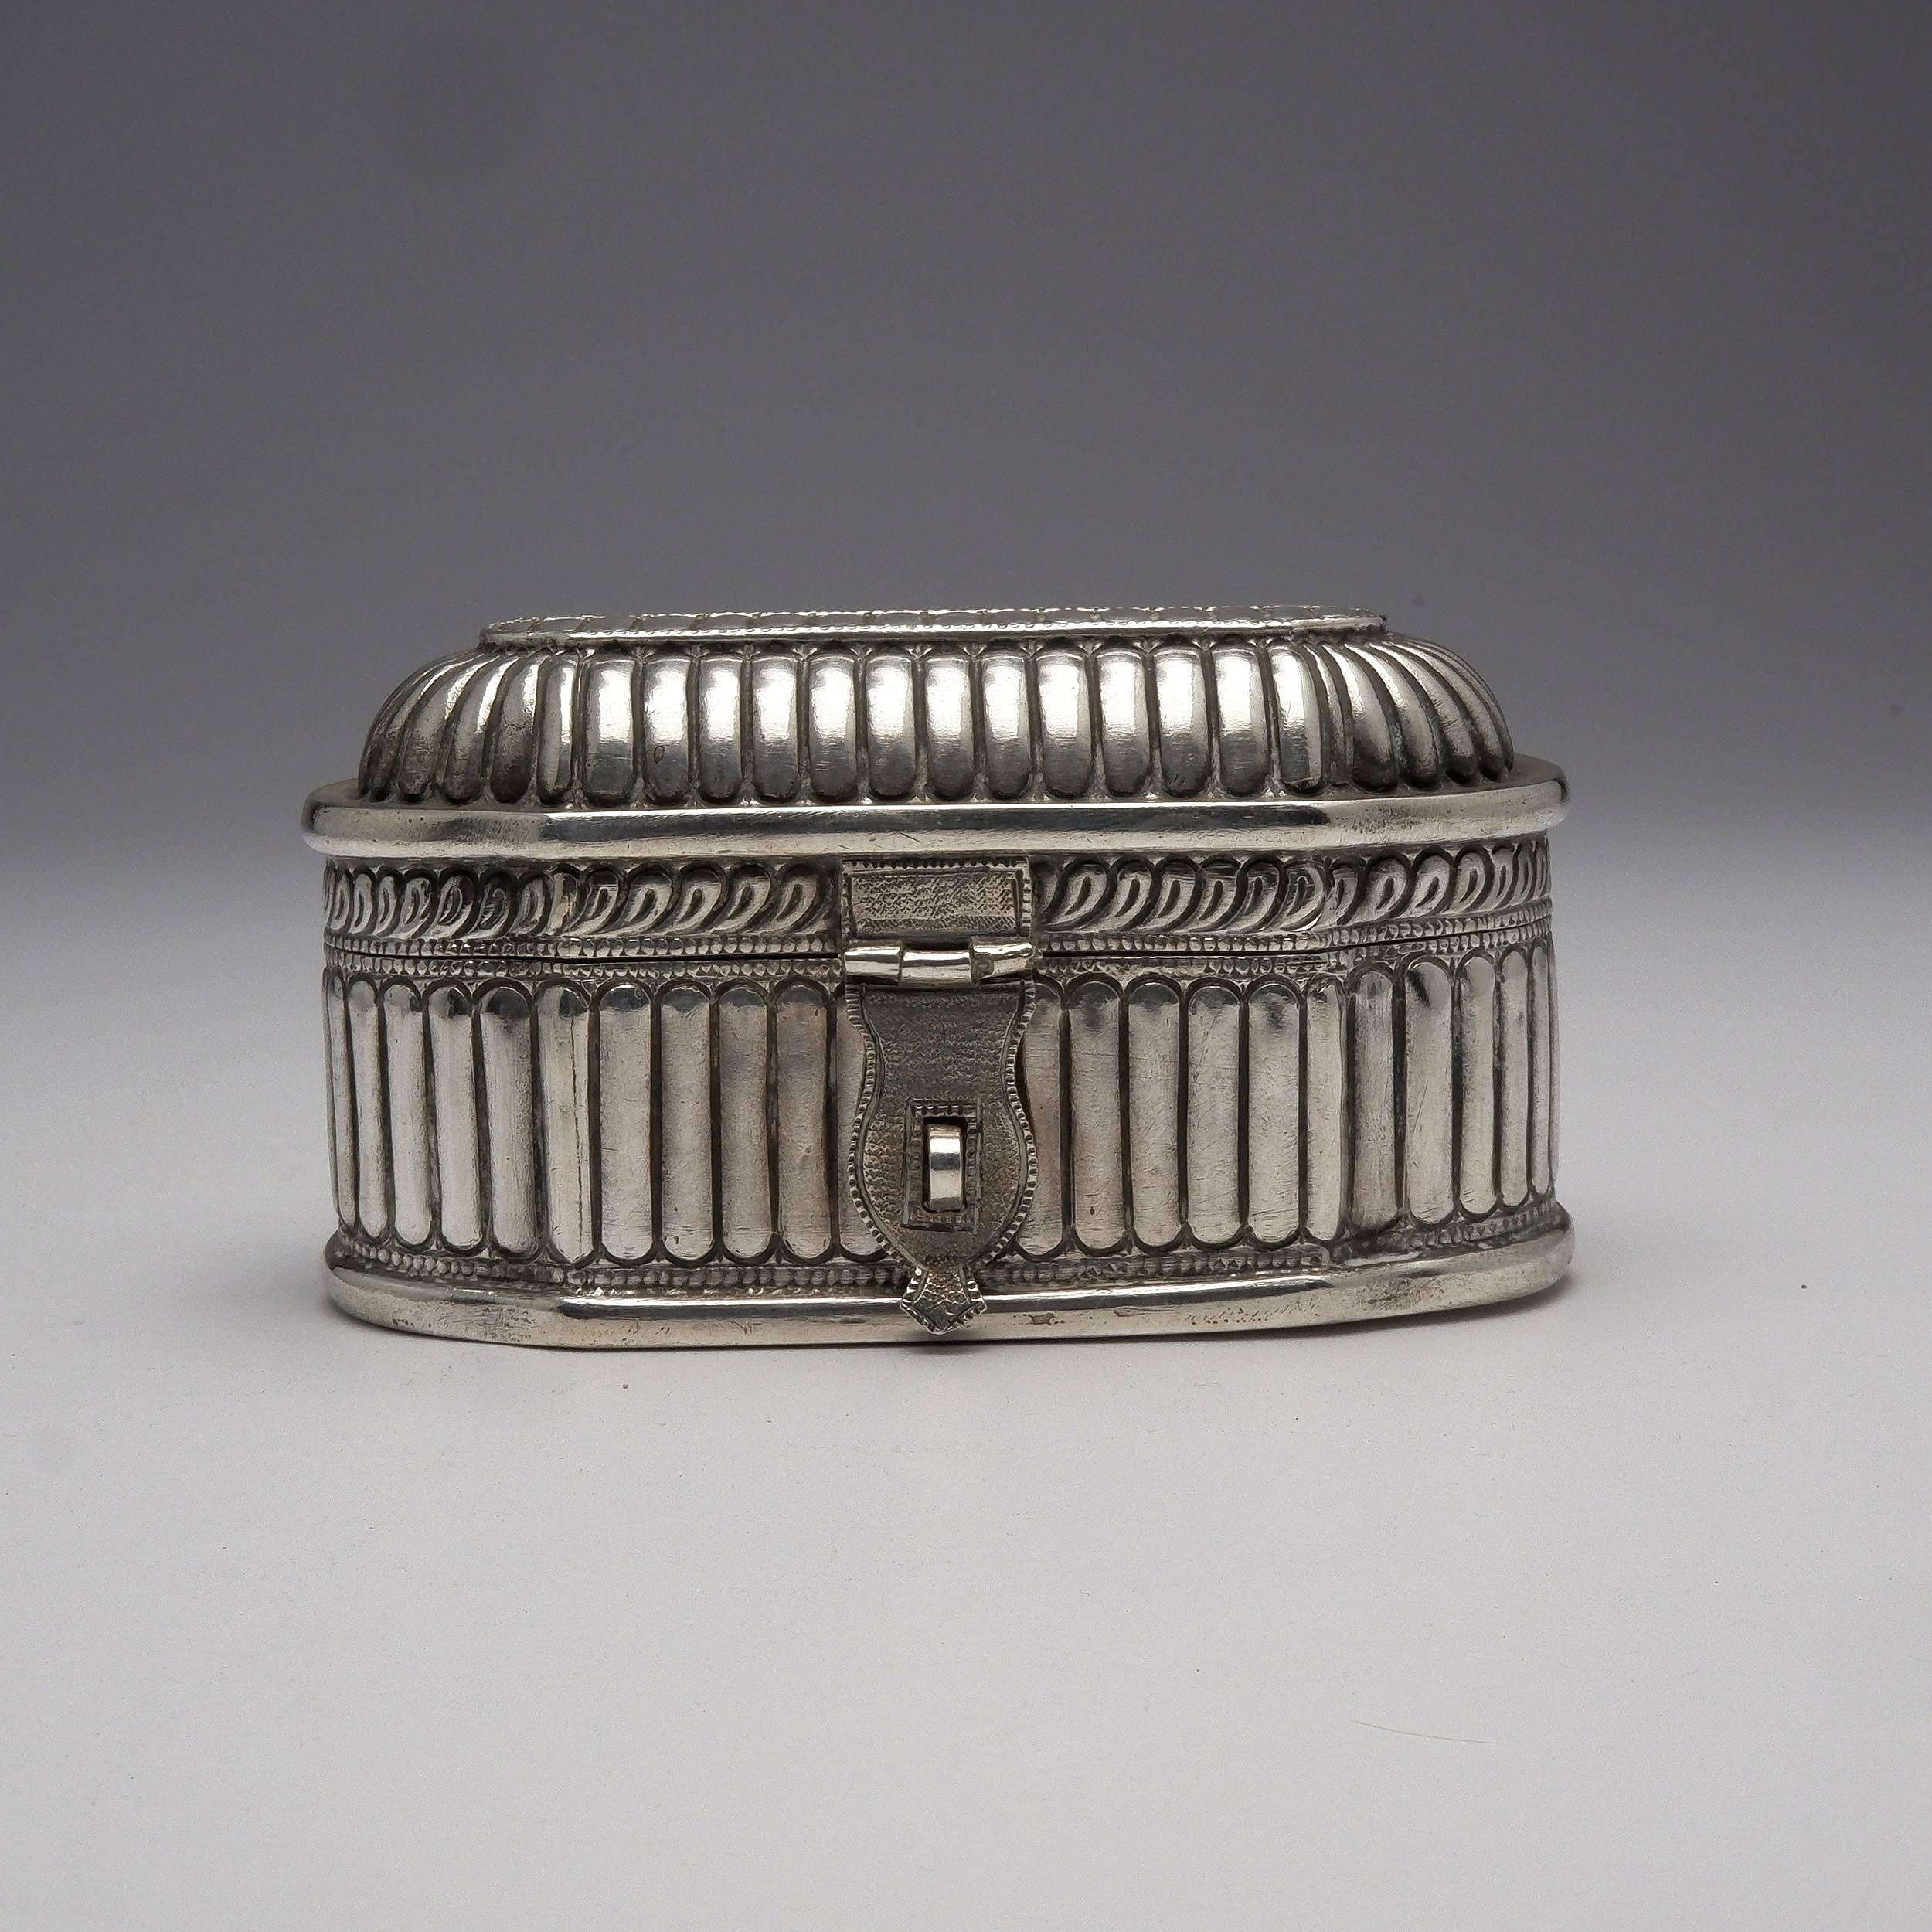 'Burmese Repousse Sterling Silver Box, 306g'